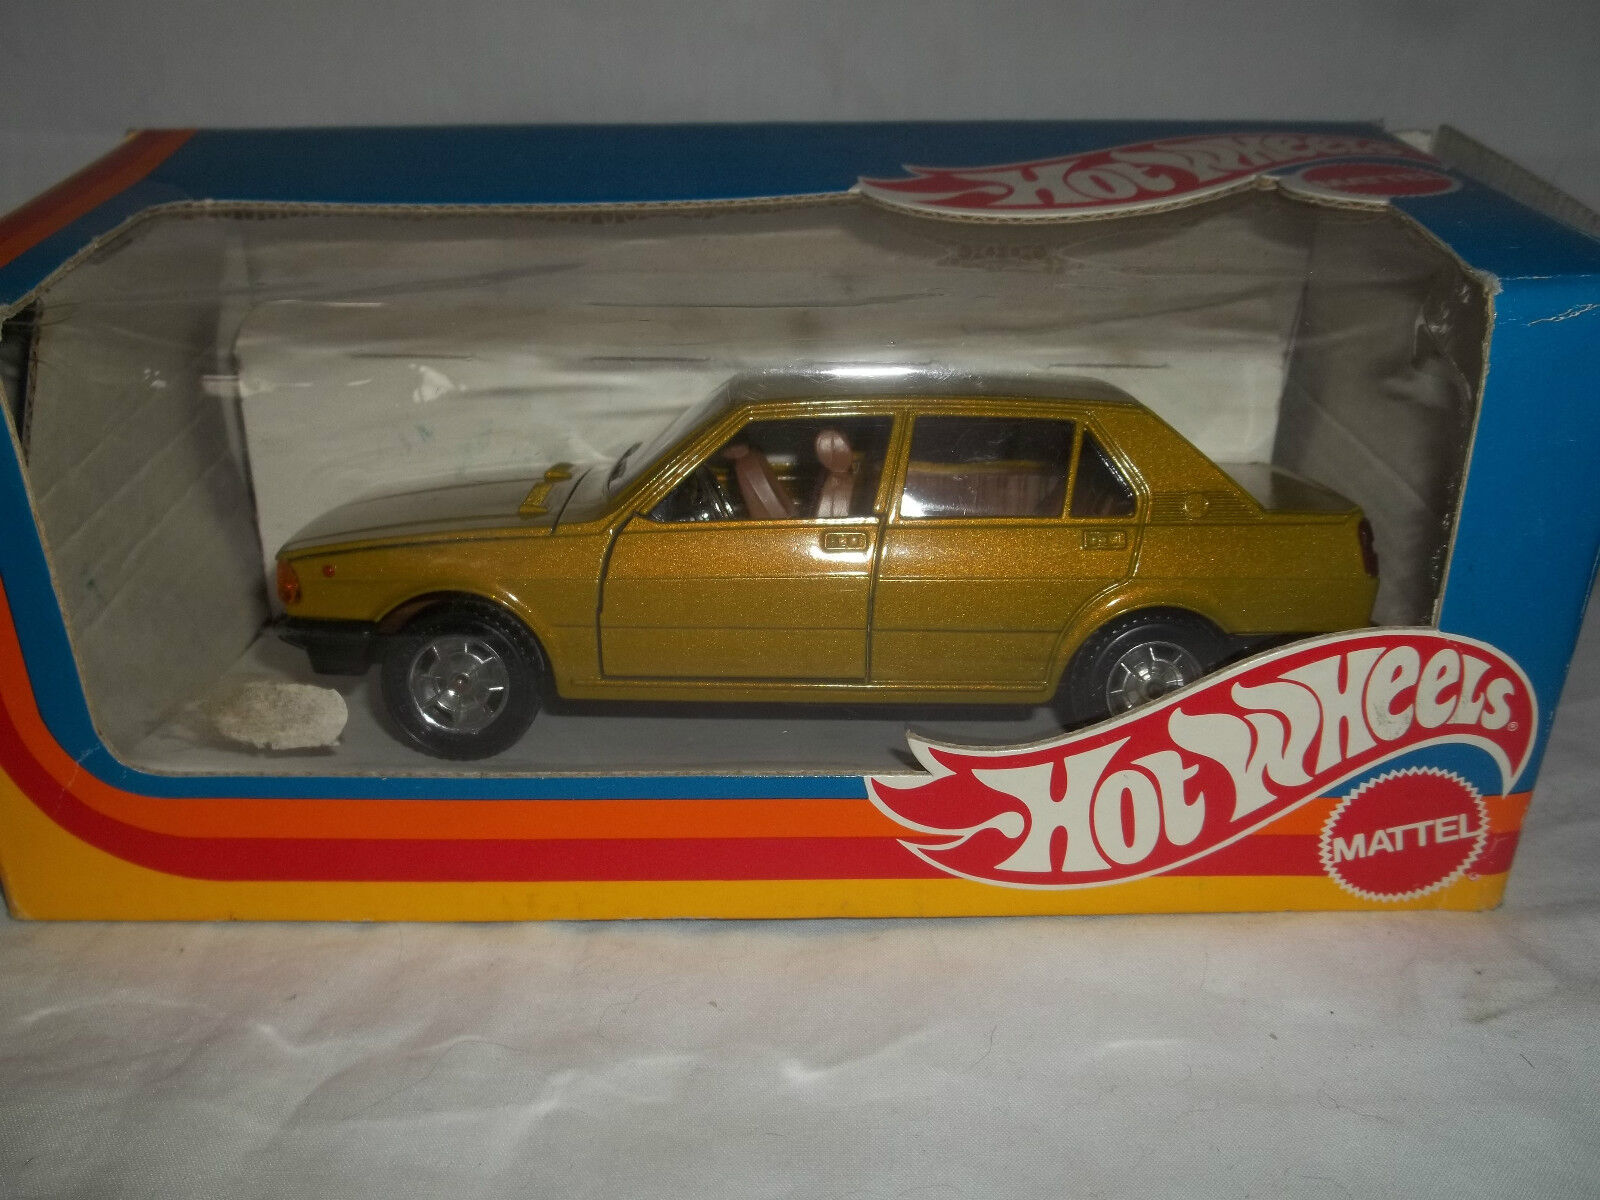 Vintage hotwheels   mattel GIULIETTA 1 25 mint & boxed (rare)